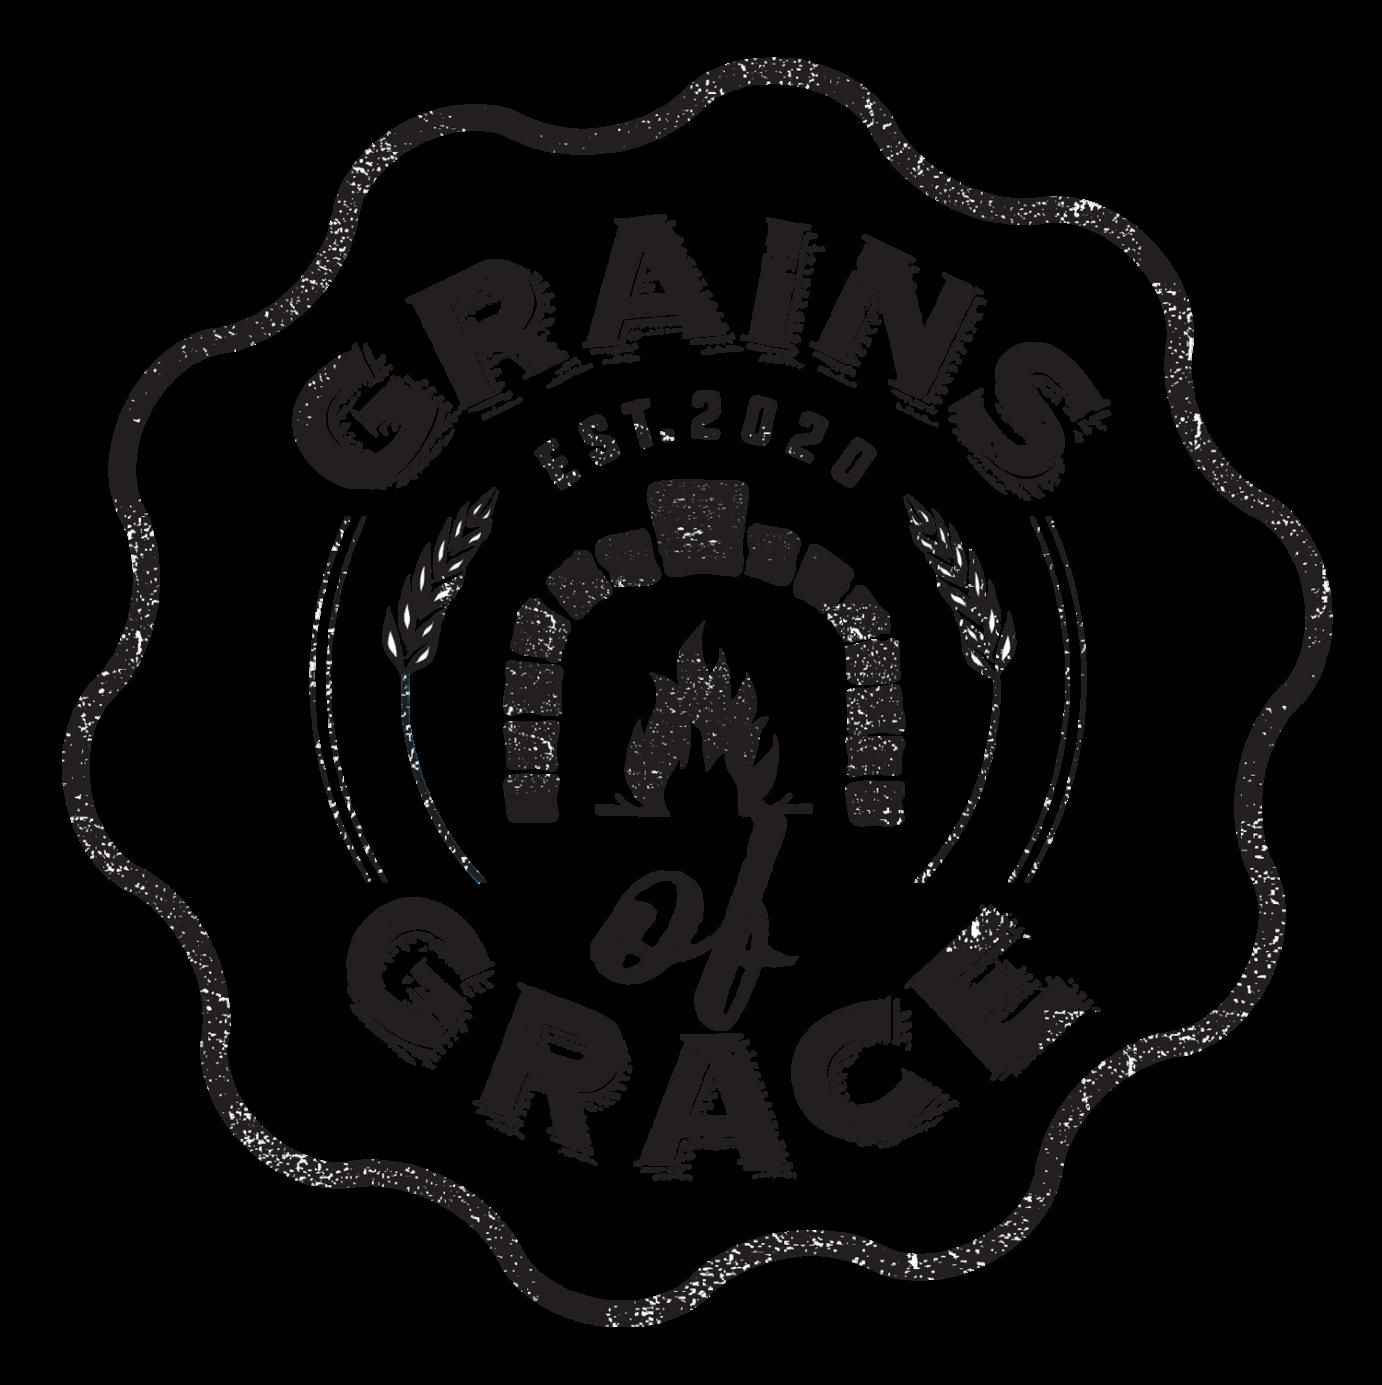 Grains of Grace logo scroll